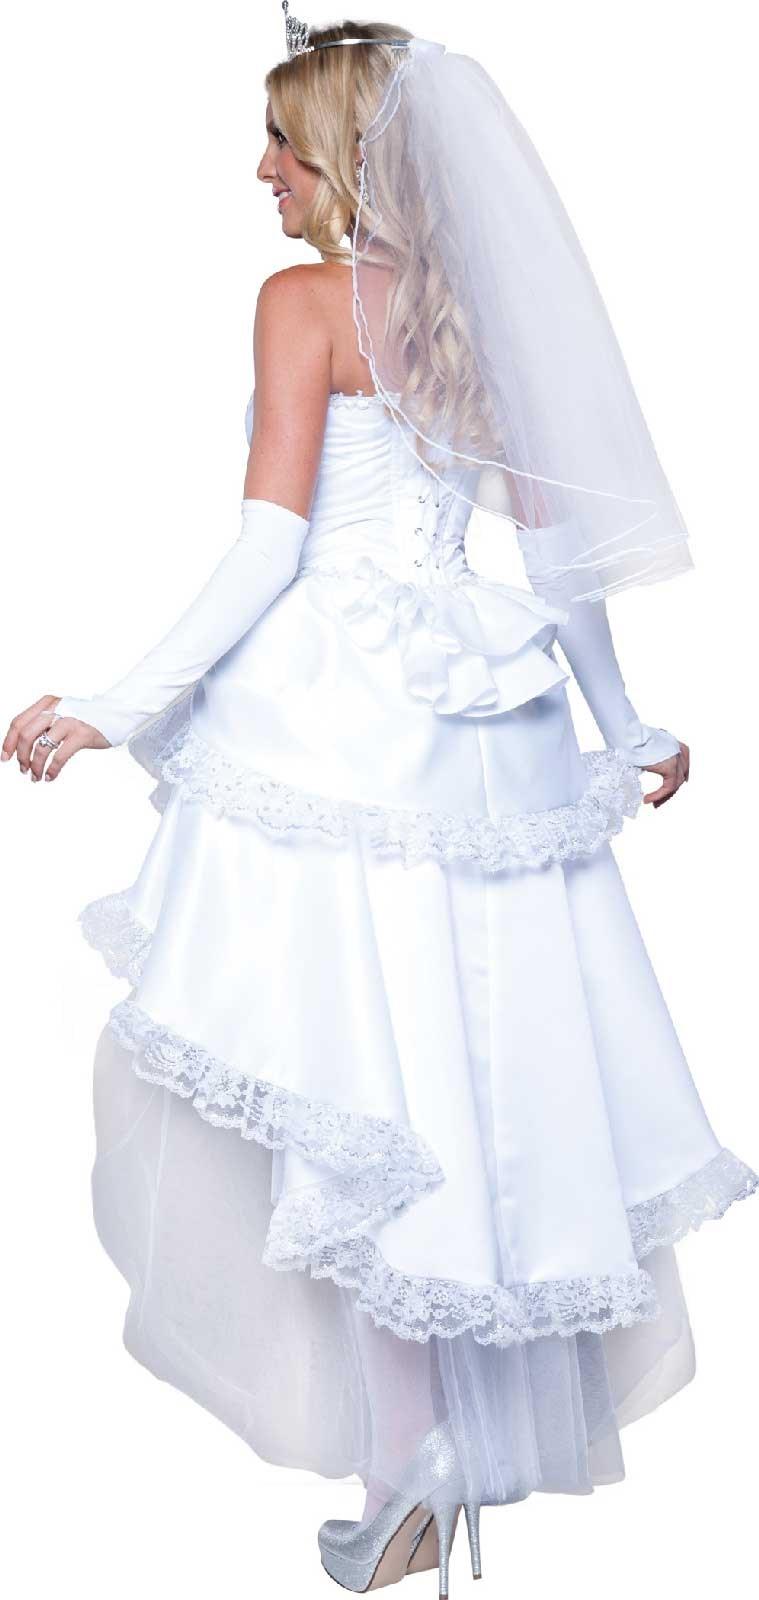 Blushing Bride Dress Womens Costume